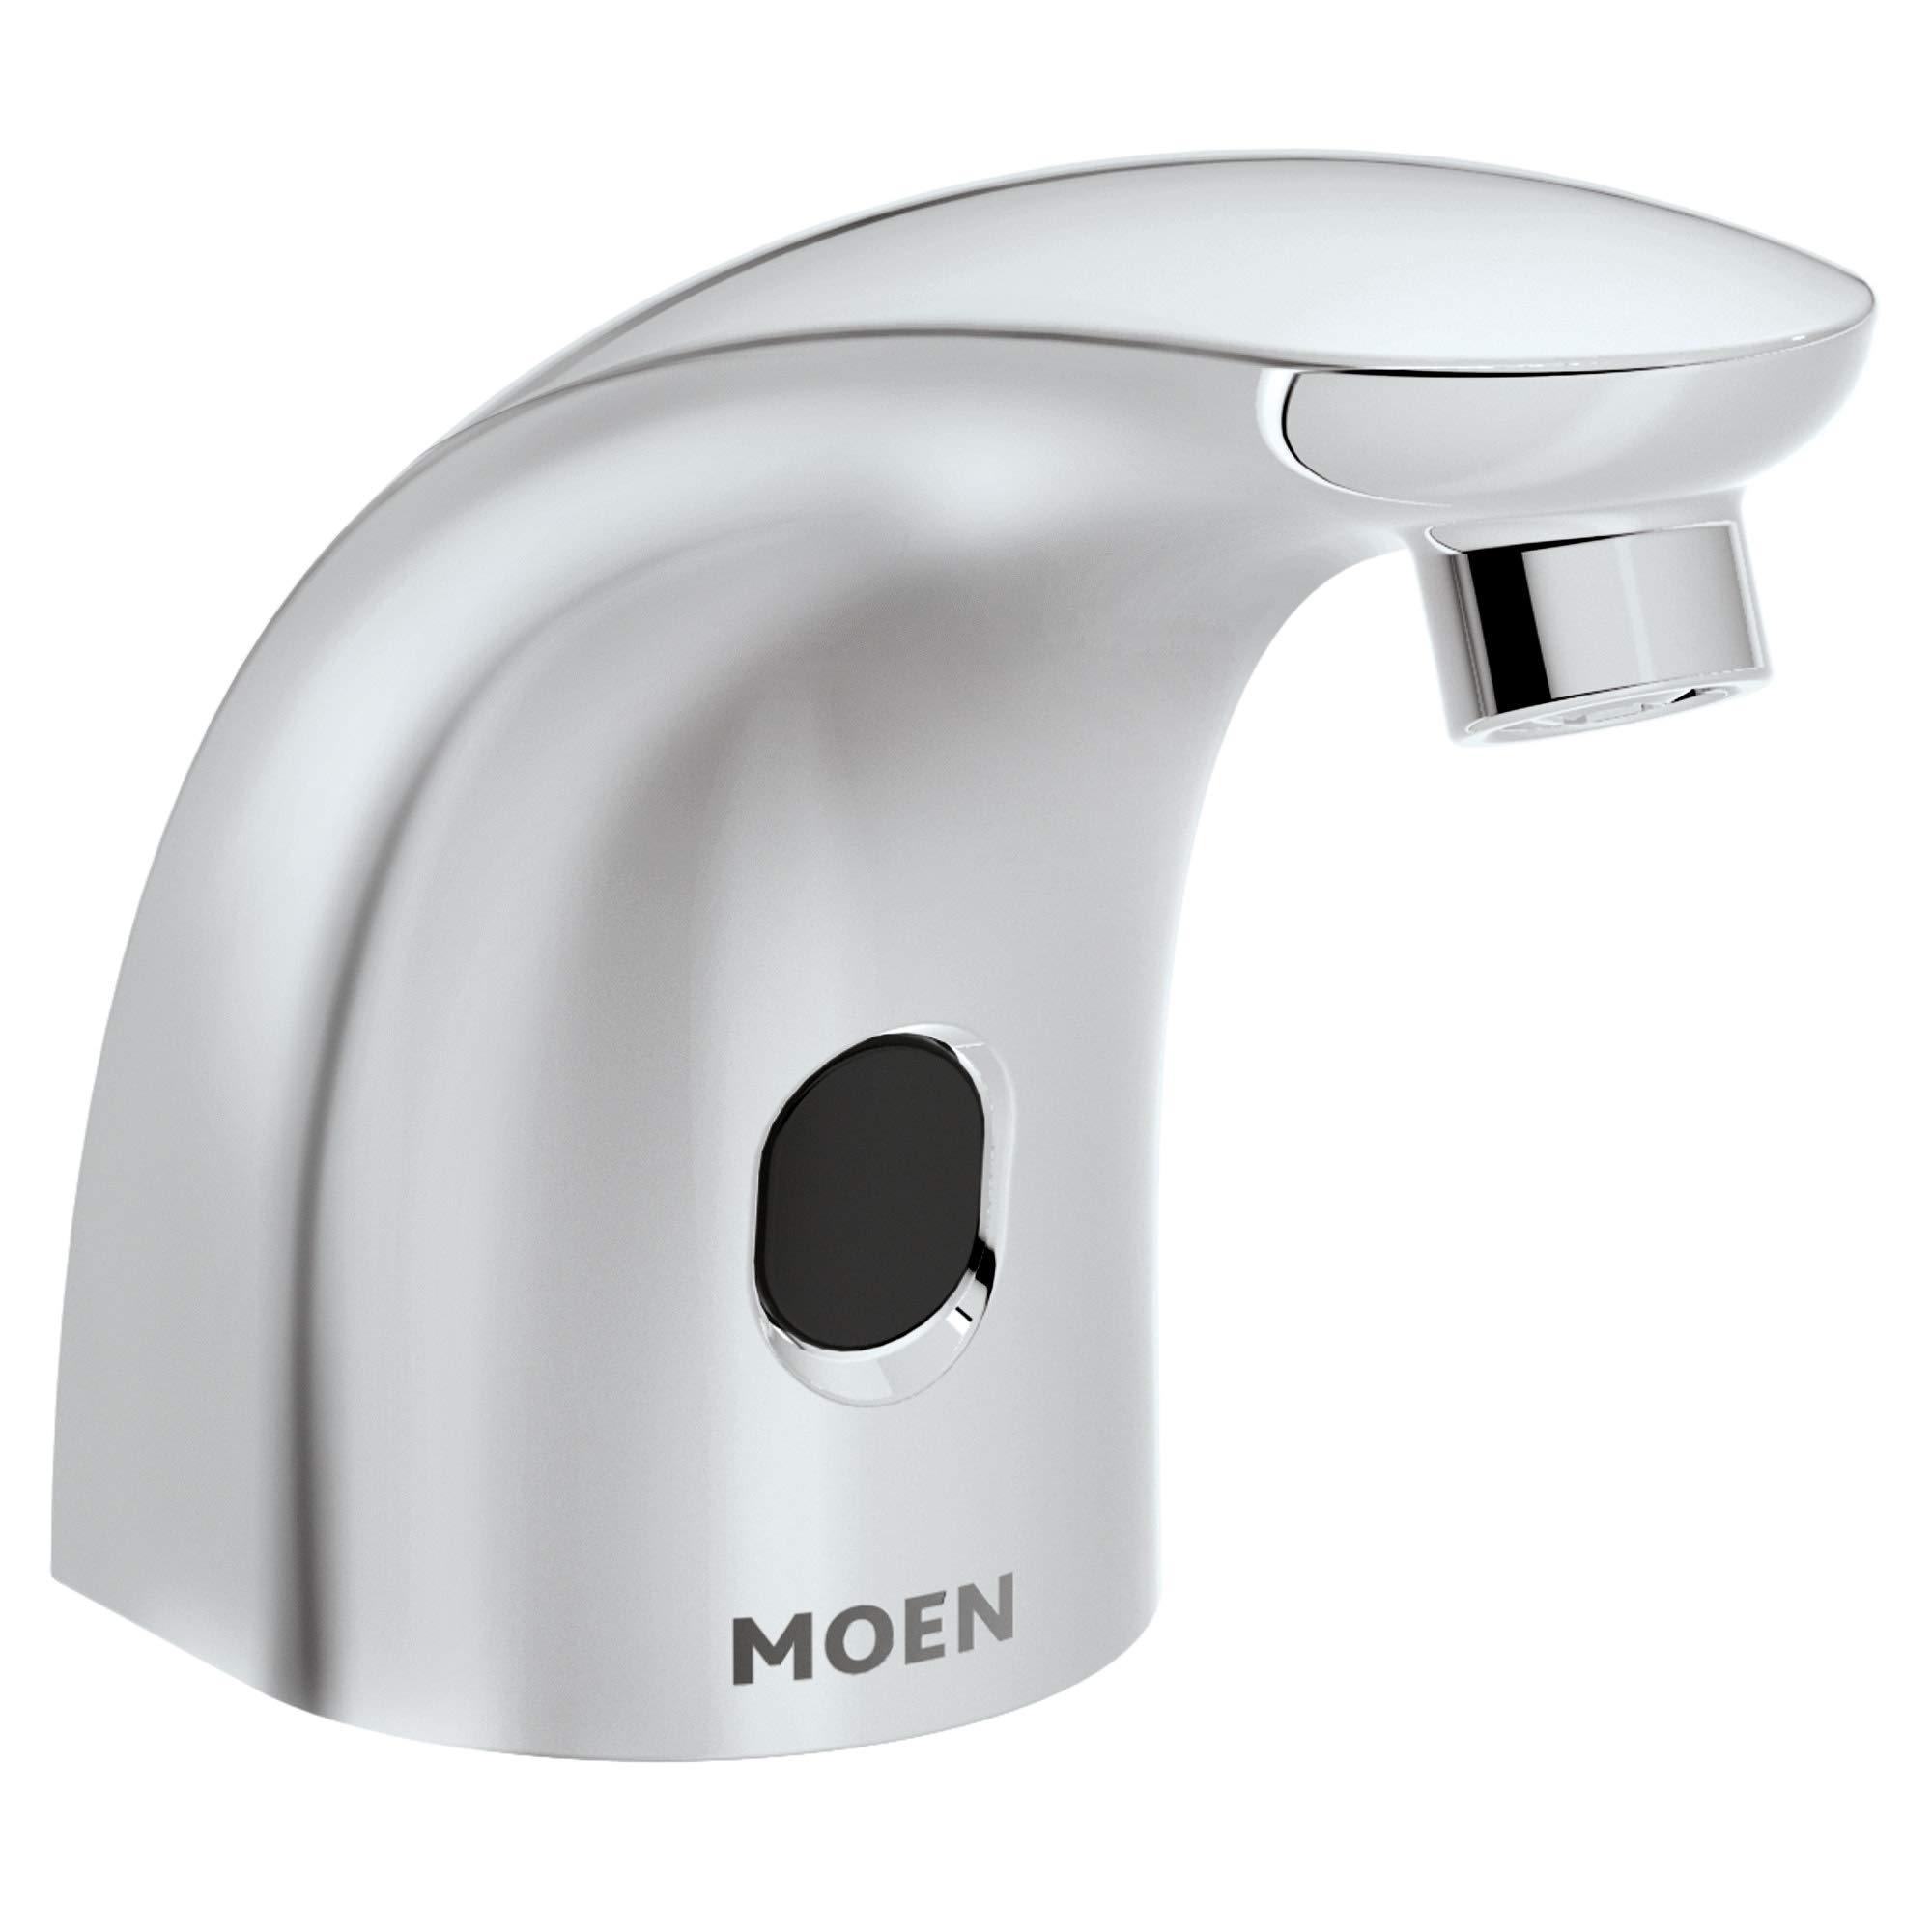 Moen 8558 M-Power Commercial Deck Mounted Touchless Foam Soap Dispenser, Chrome